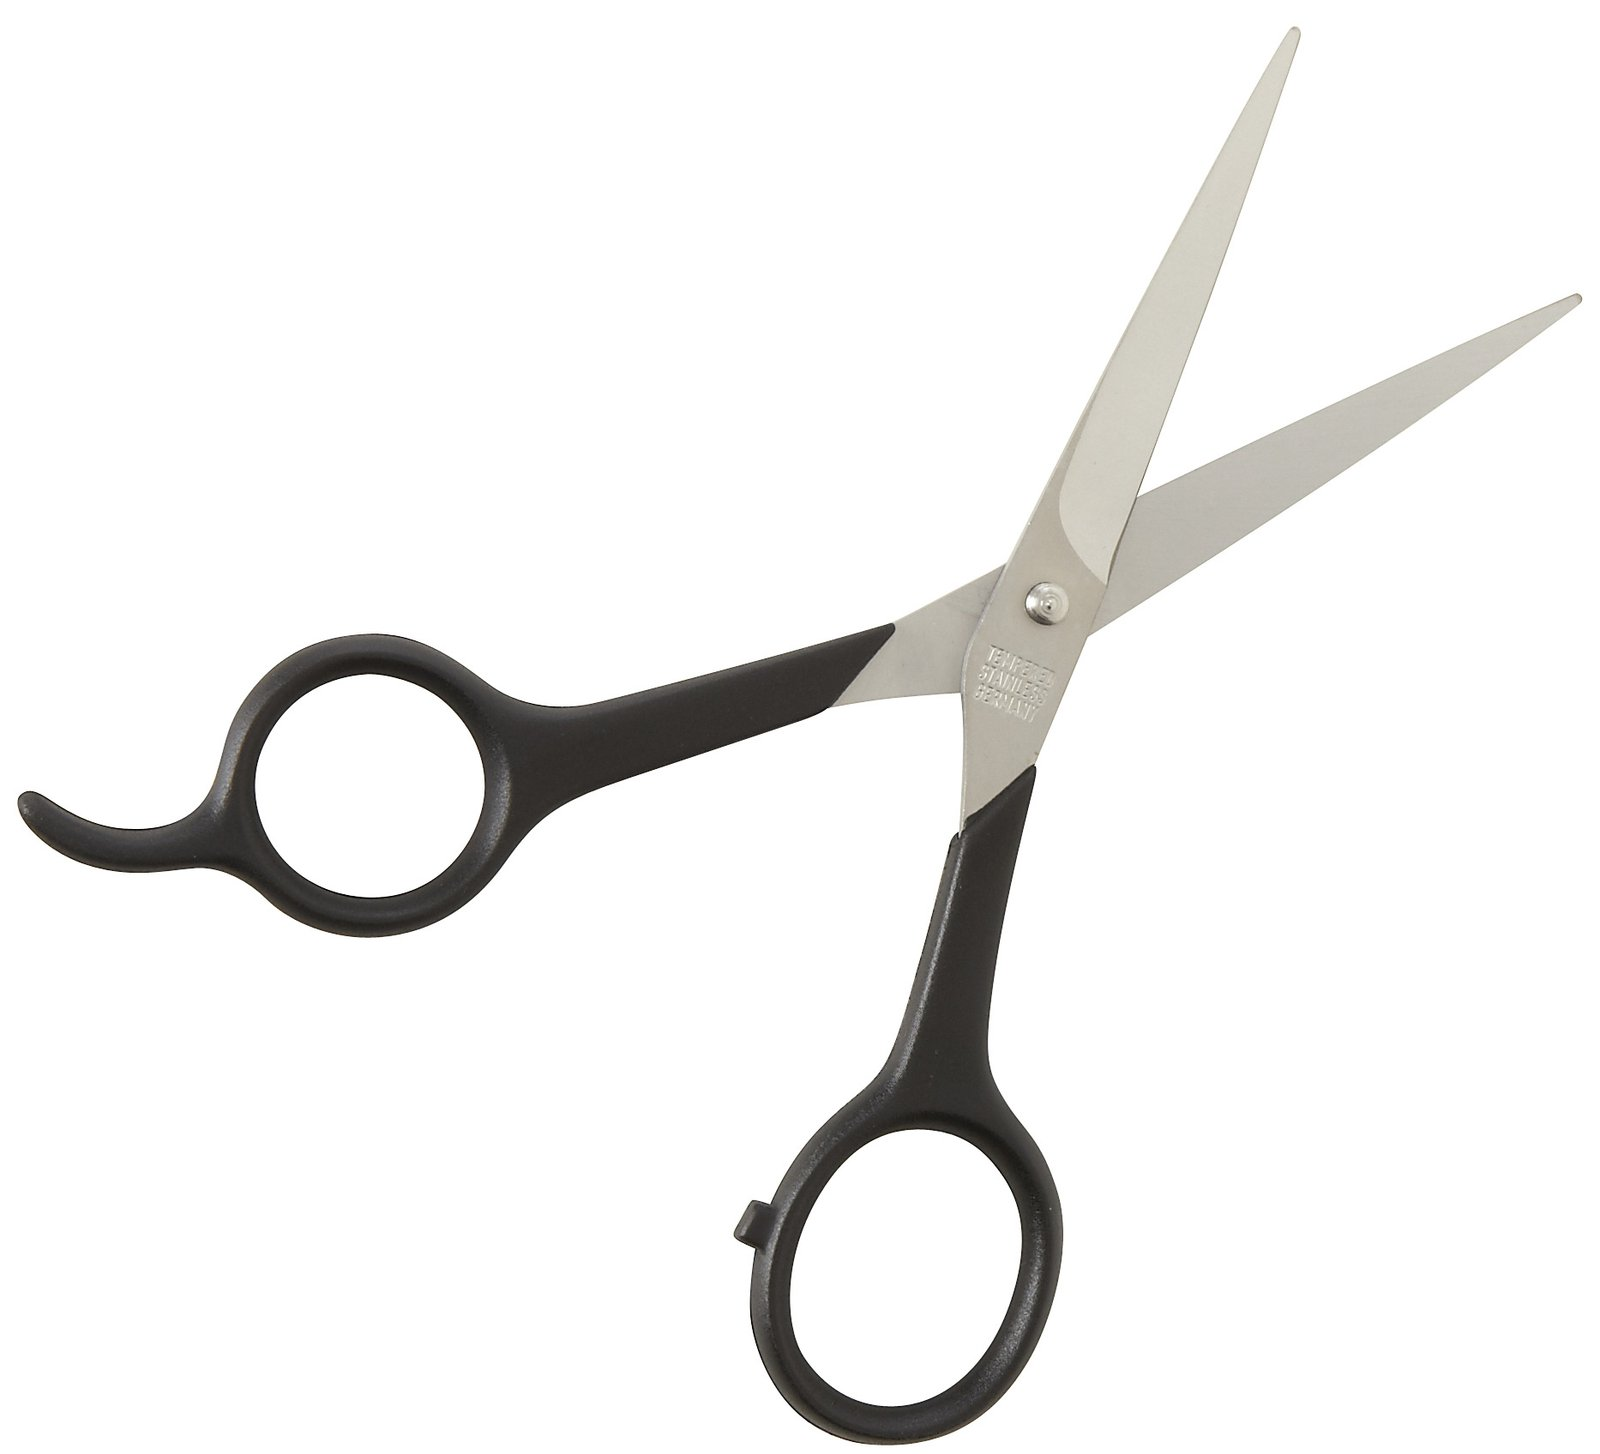 Silver scissors clipart svg free download Scissors And Comb Clipart | Free download best Scissors And ... svg free download